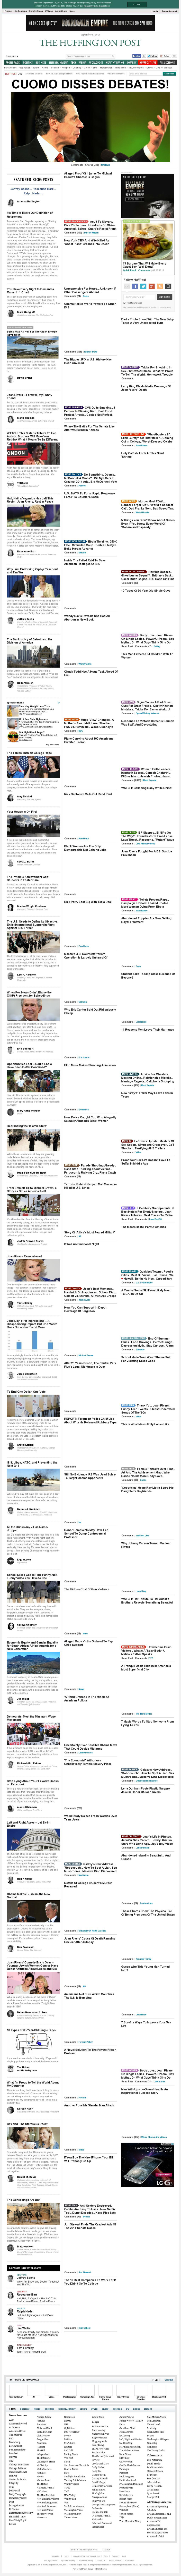 The Huffington Post at Saturday Sept. 6, 2014, 2:11 a.m. UTC